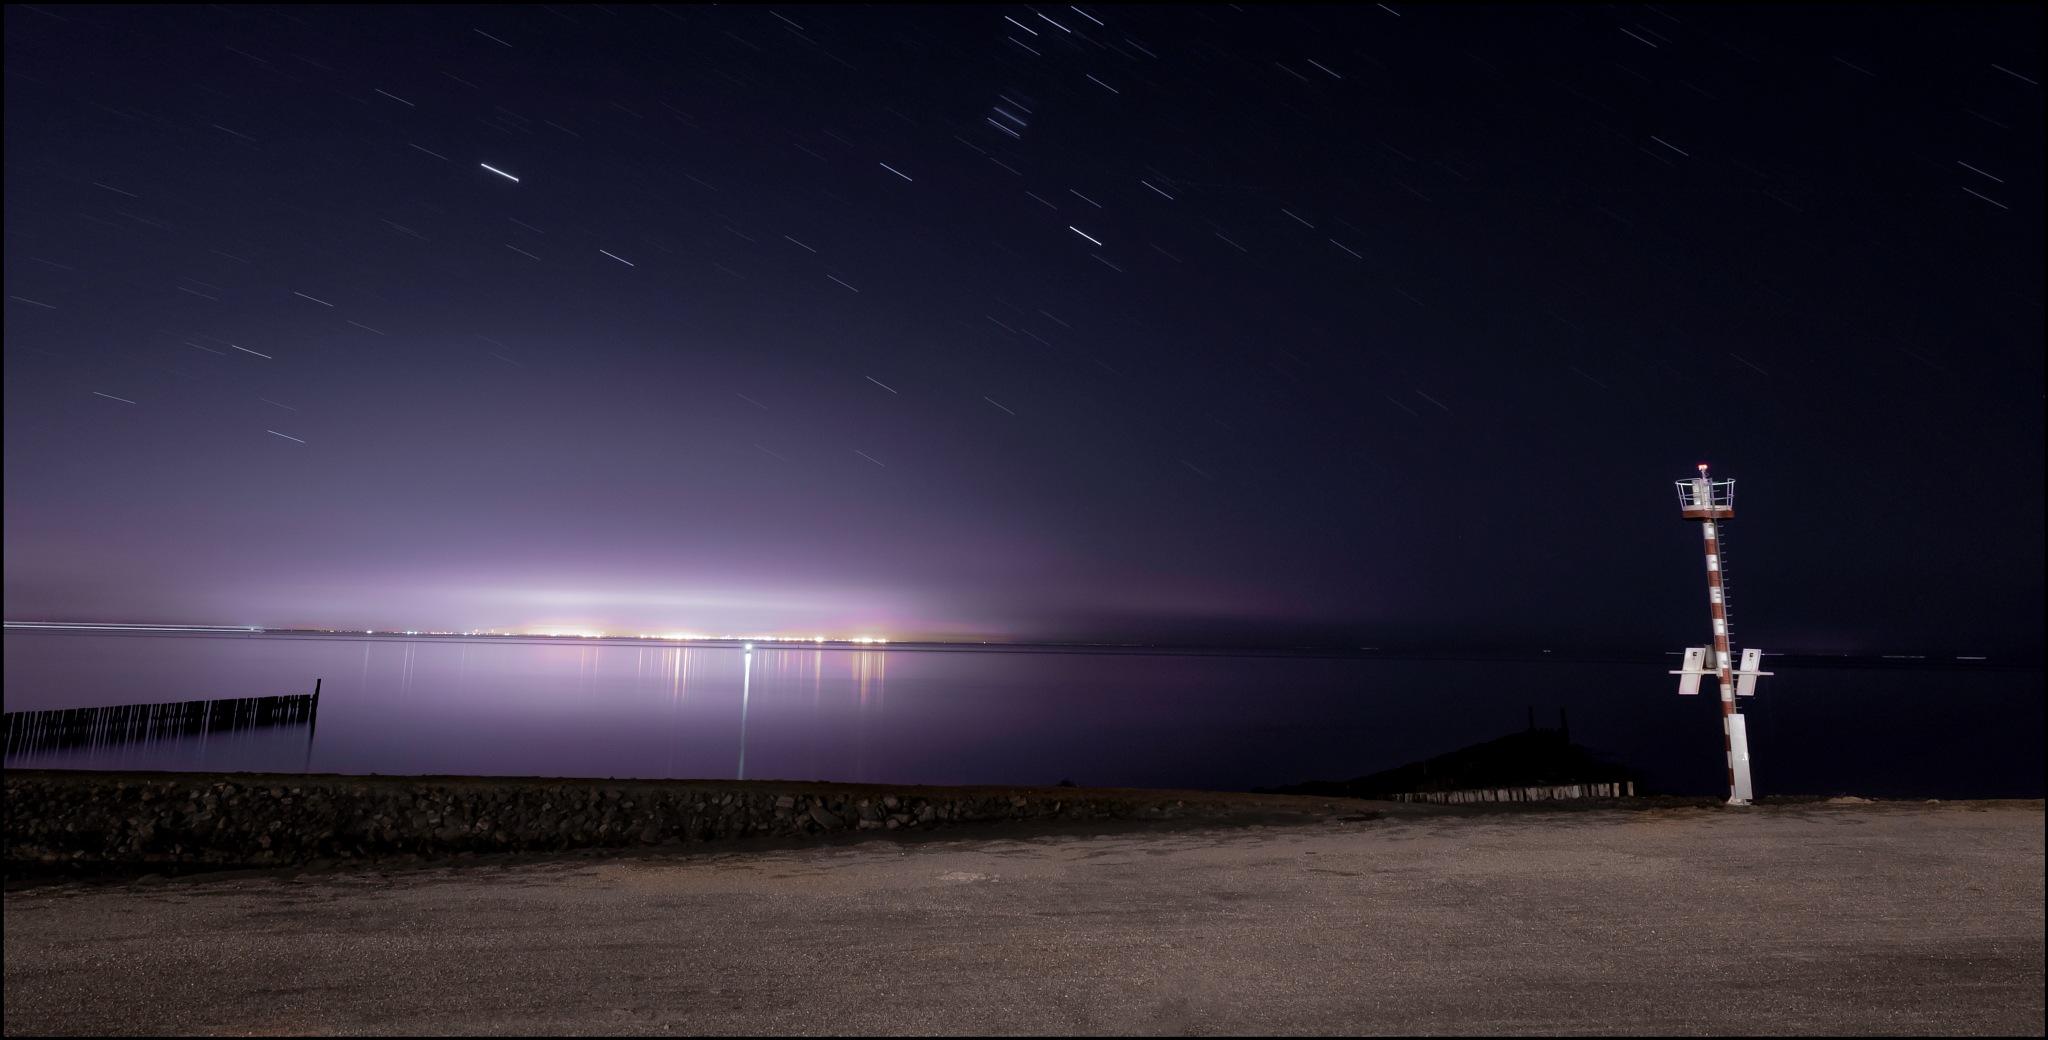 Photo in Random #sea #beach #sand #coast #holland #netherlands #expose #purple sky #putple #tranquillity #long exposure #exposer #distance #location #lighthouse #nikon #nikonphotography